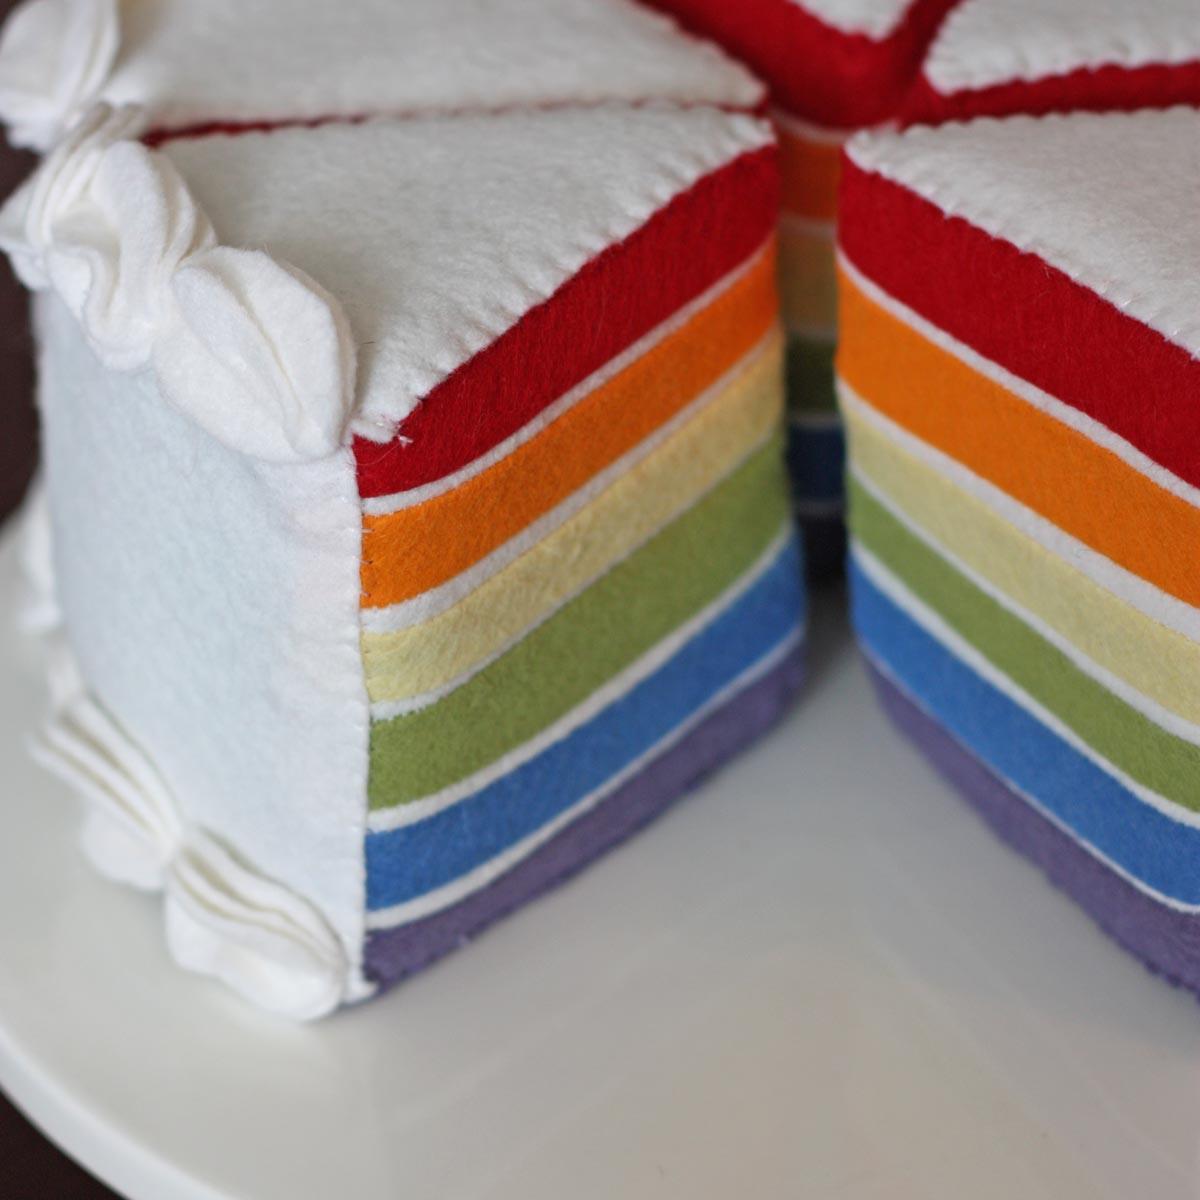 Resep Rainbow Cake Yang Sedang Hot ~ Berita|Gadget|Tekno|Budaya| Apa ...